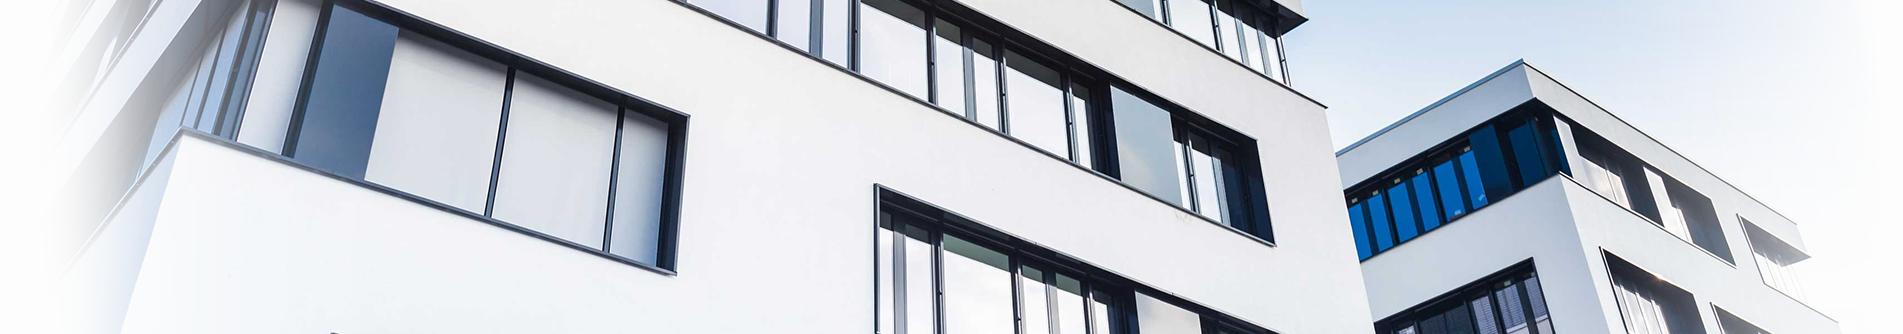 365.IMMO Immobilien Makler Software online Provaria